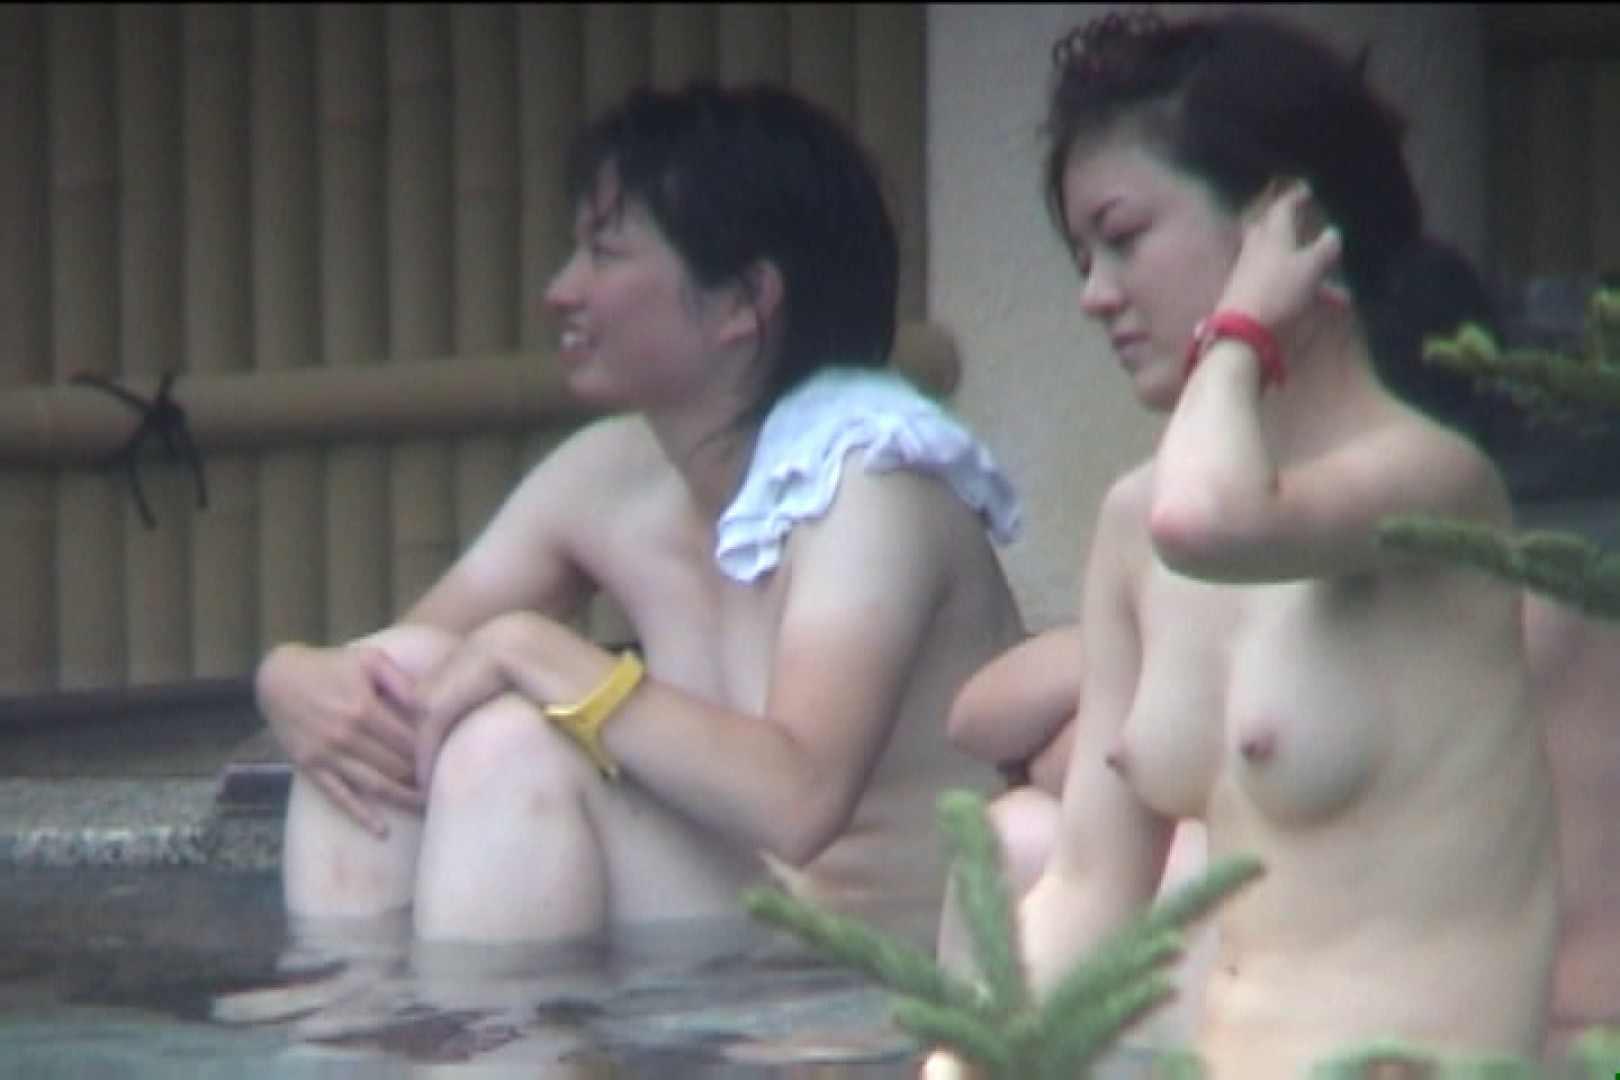 Aquaな露天風呂Vol.94【VIP限定】 盗撮シリーズ | 露天風呂編  111PIX 31